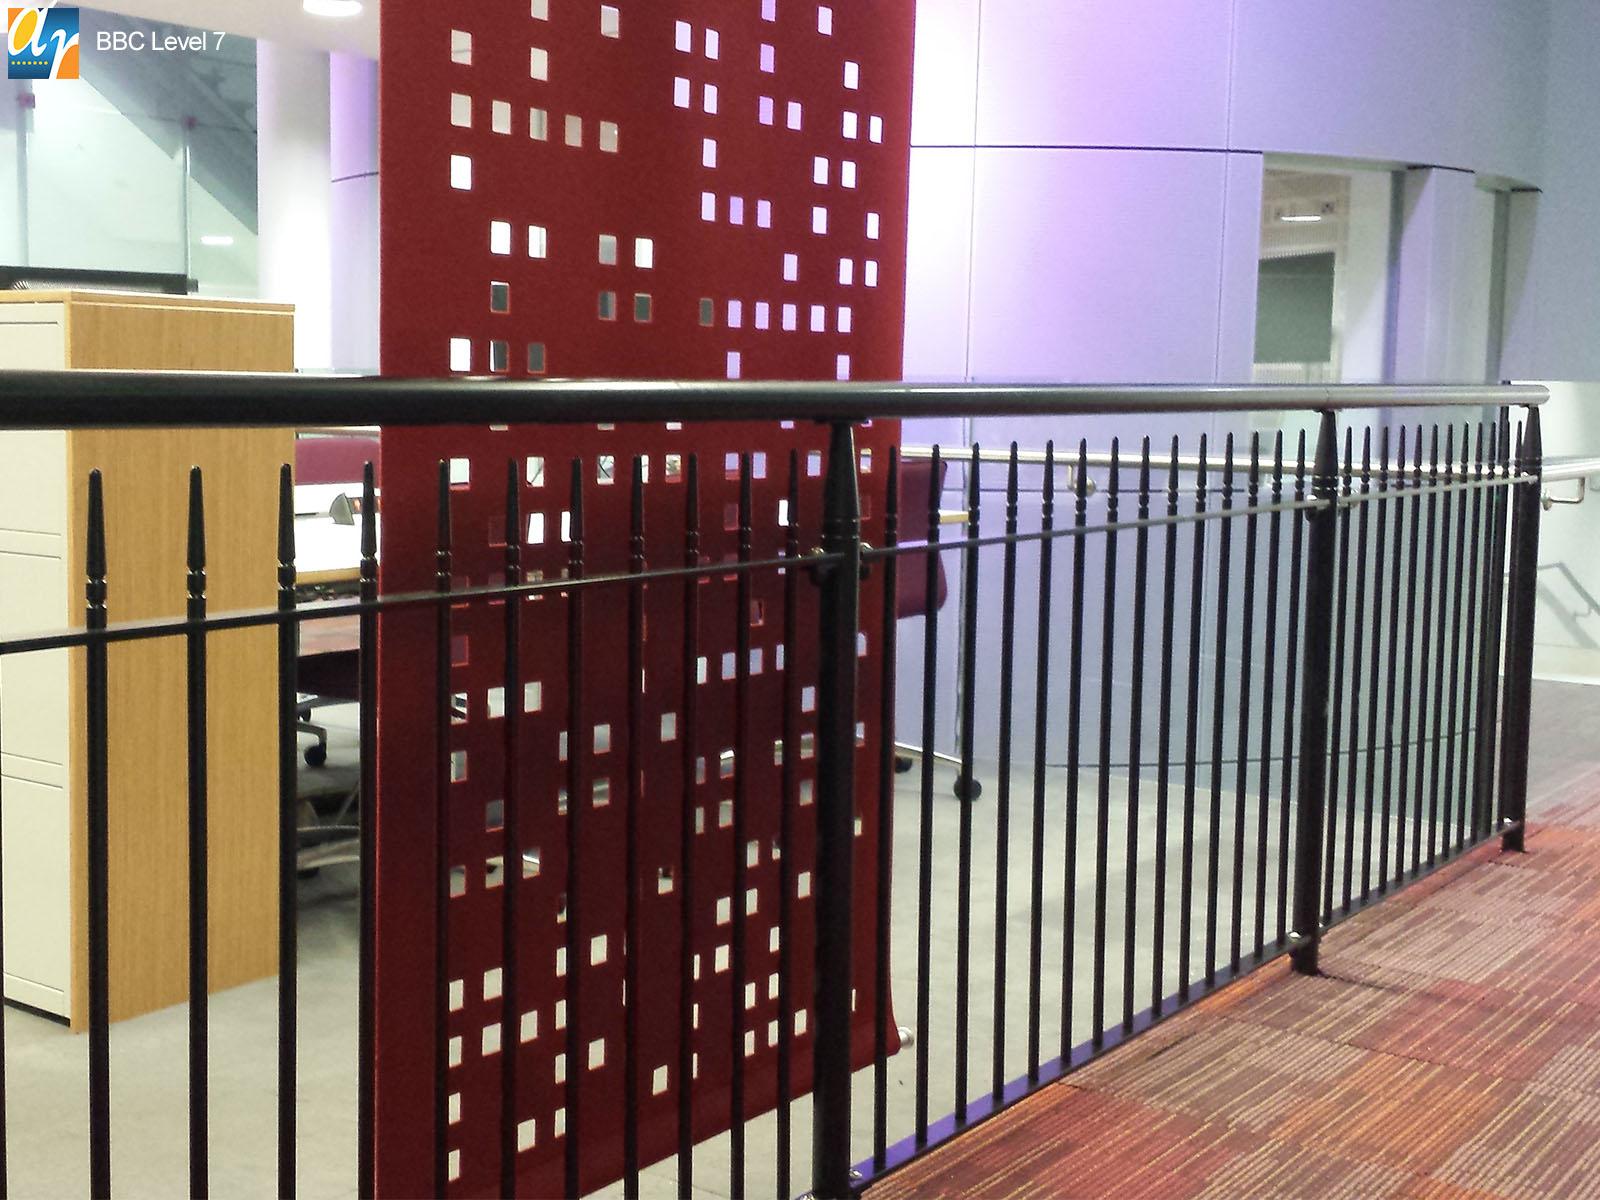 BBC albany vertical bar railings